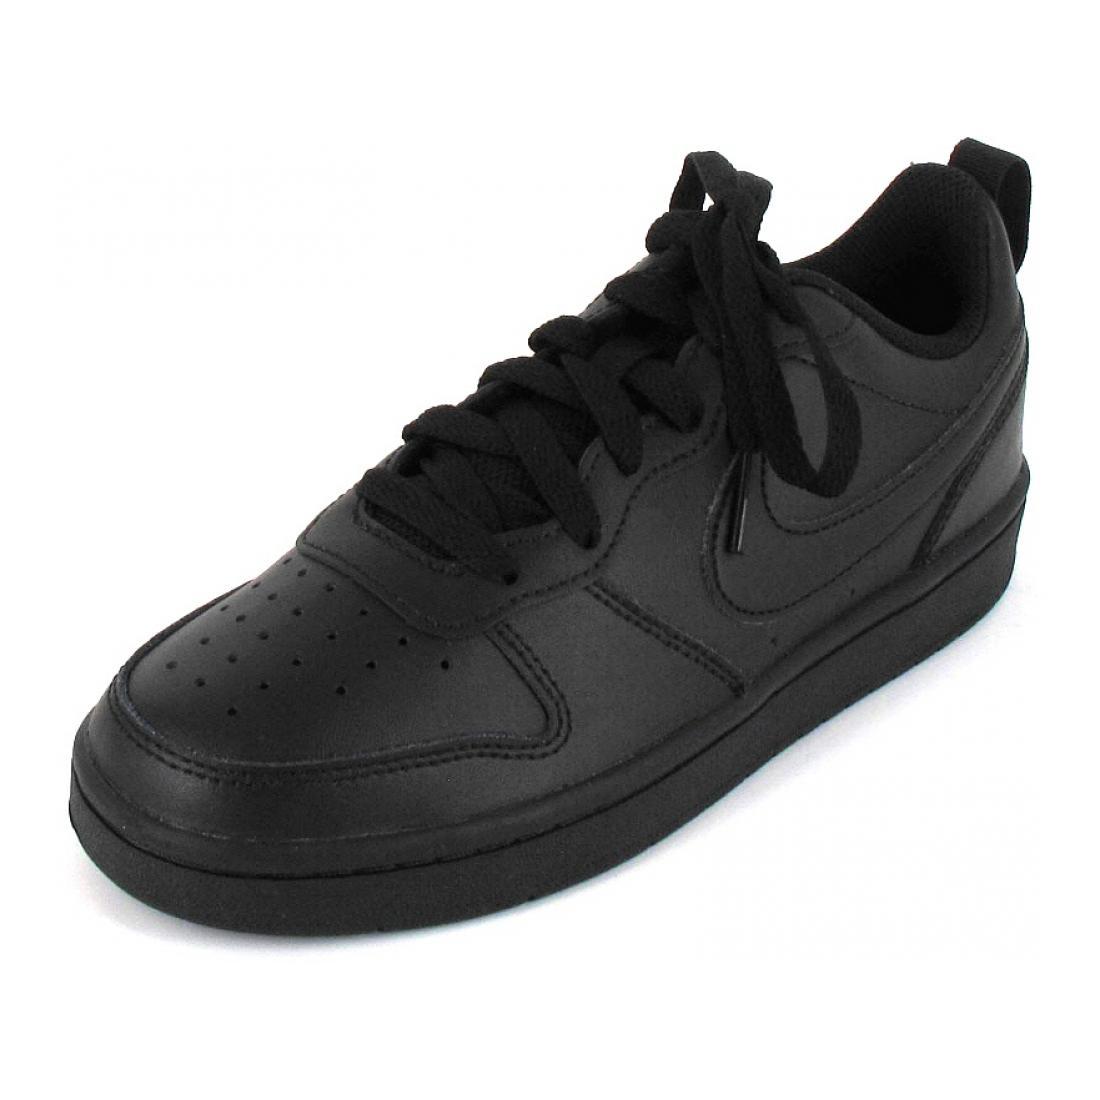 Nike Sportschuh Court Borough Low c 2